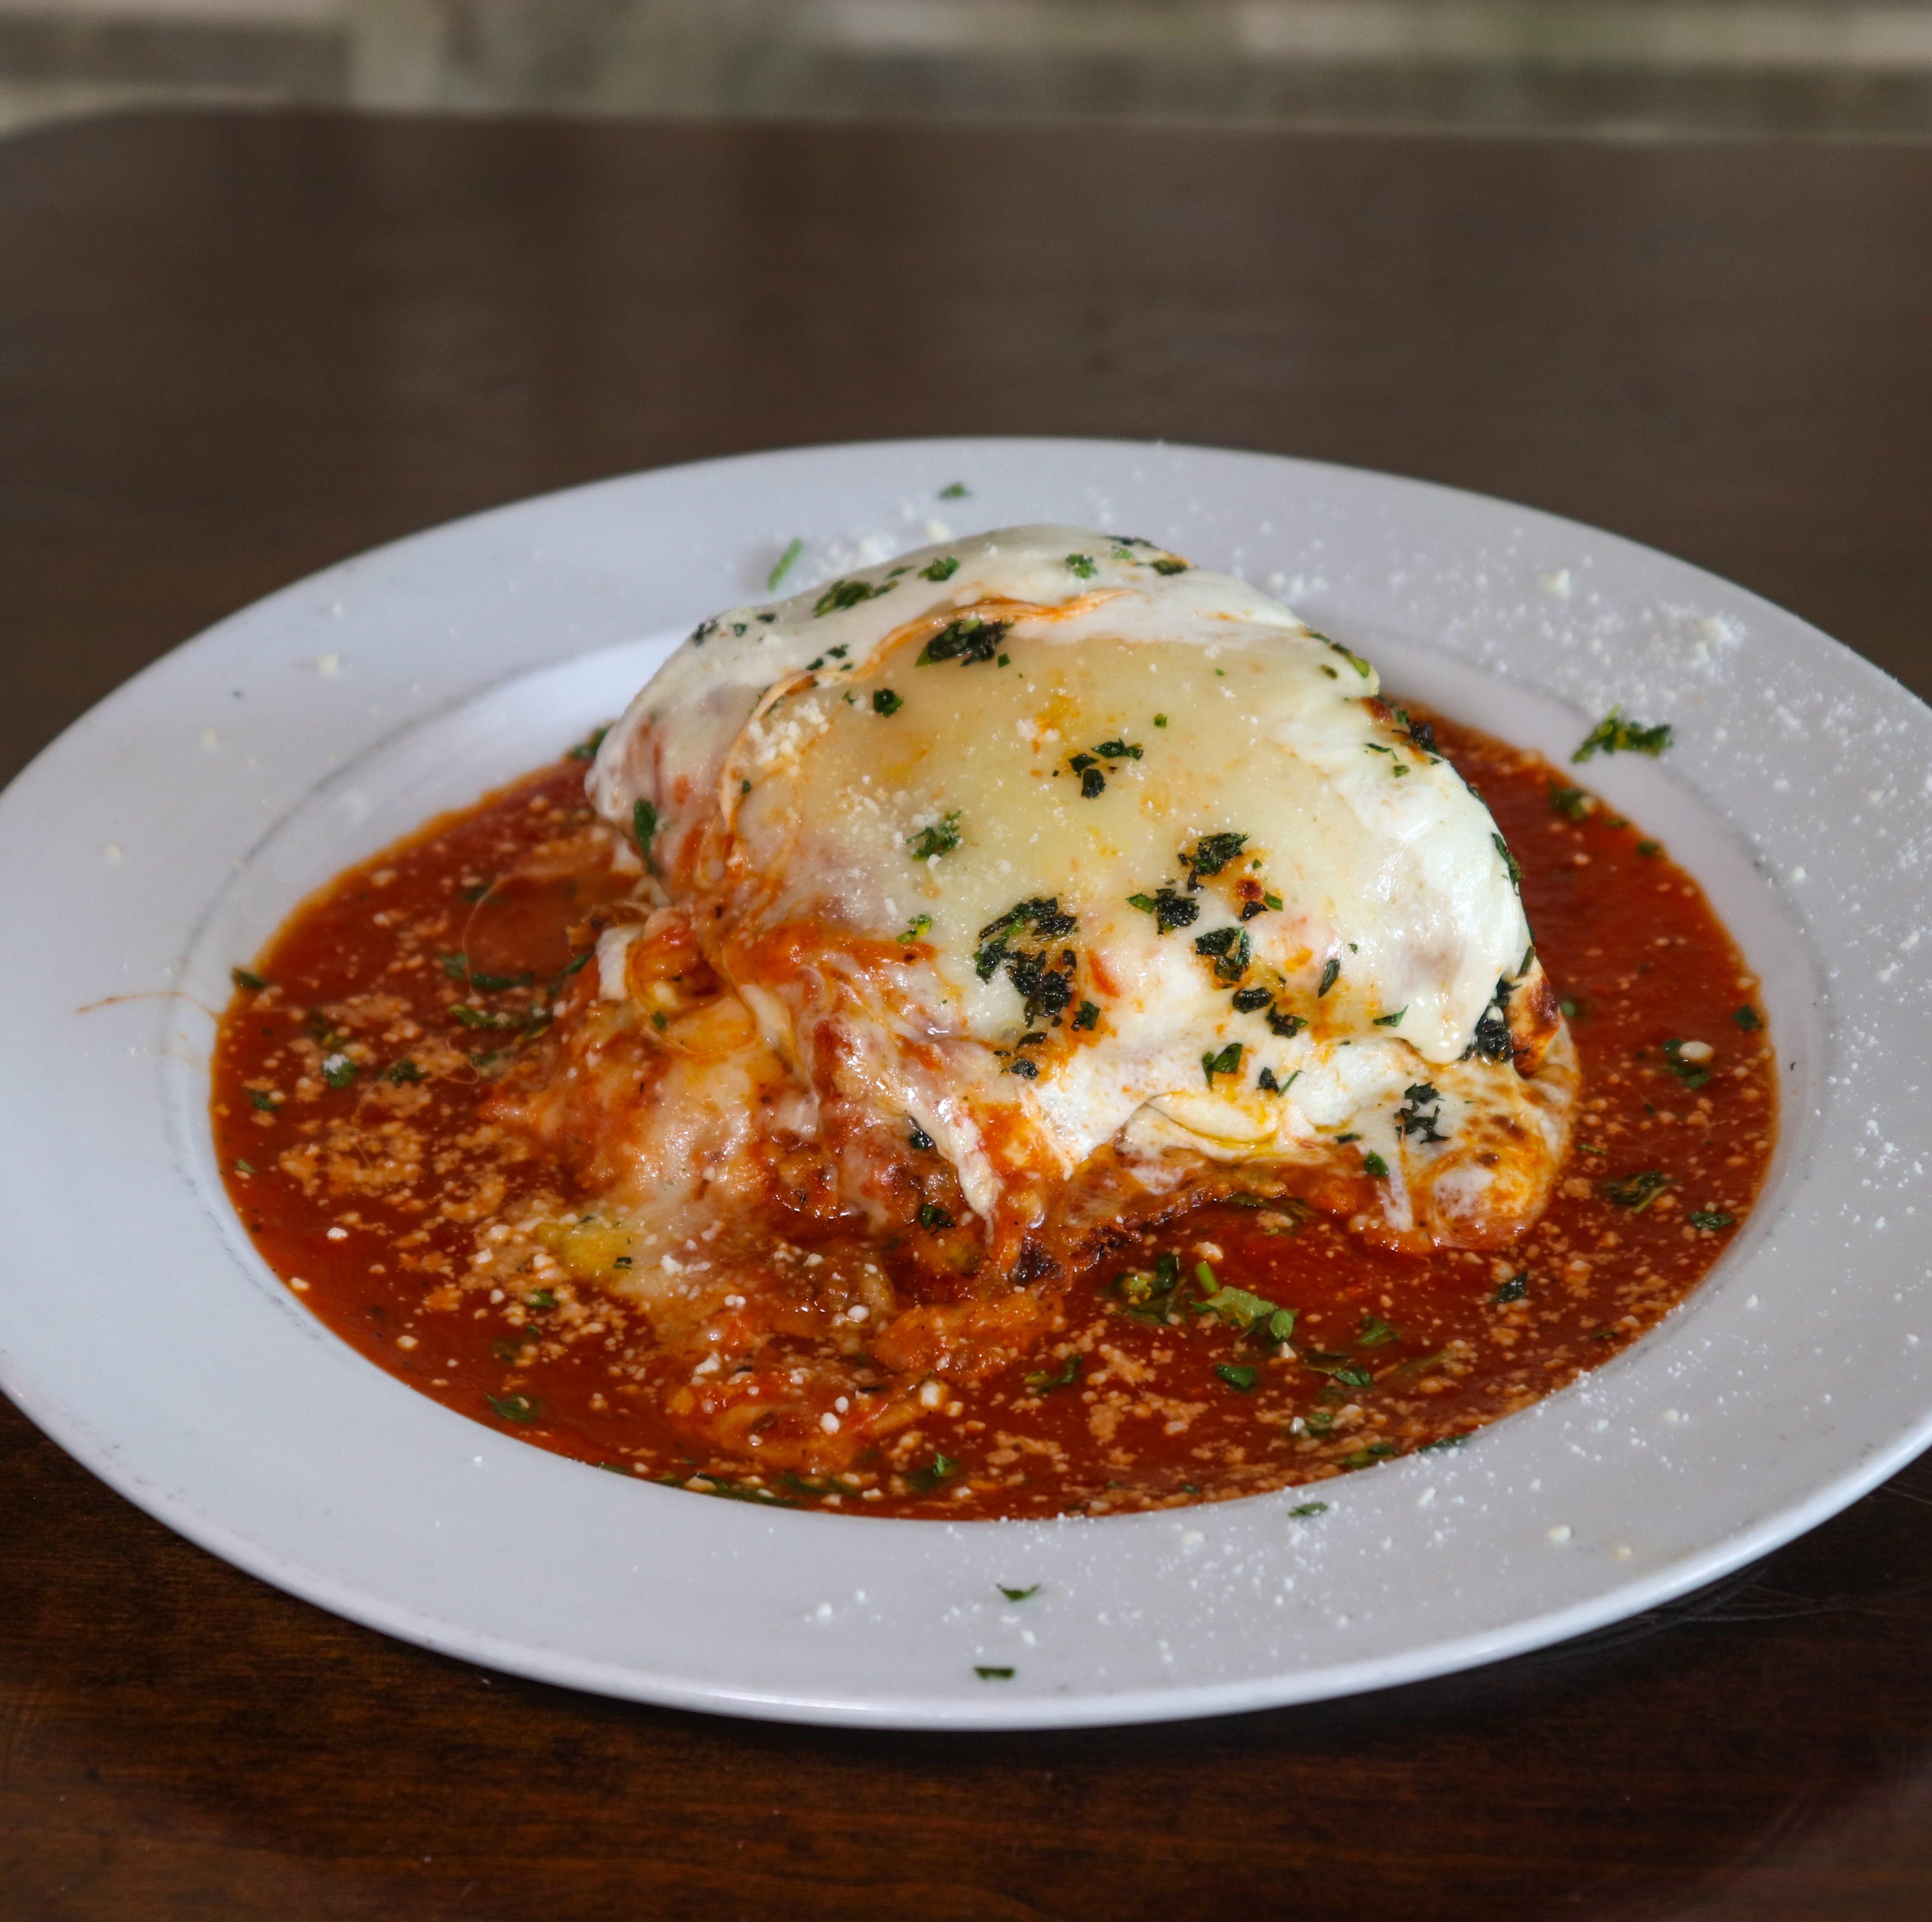 Crust pizzeria and Italian restaurant returns to Scottsdale